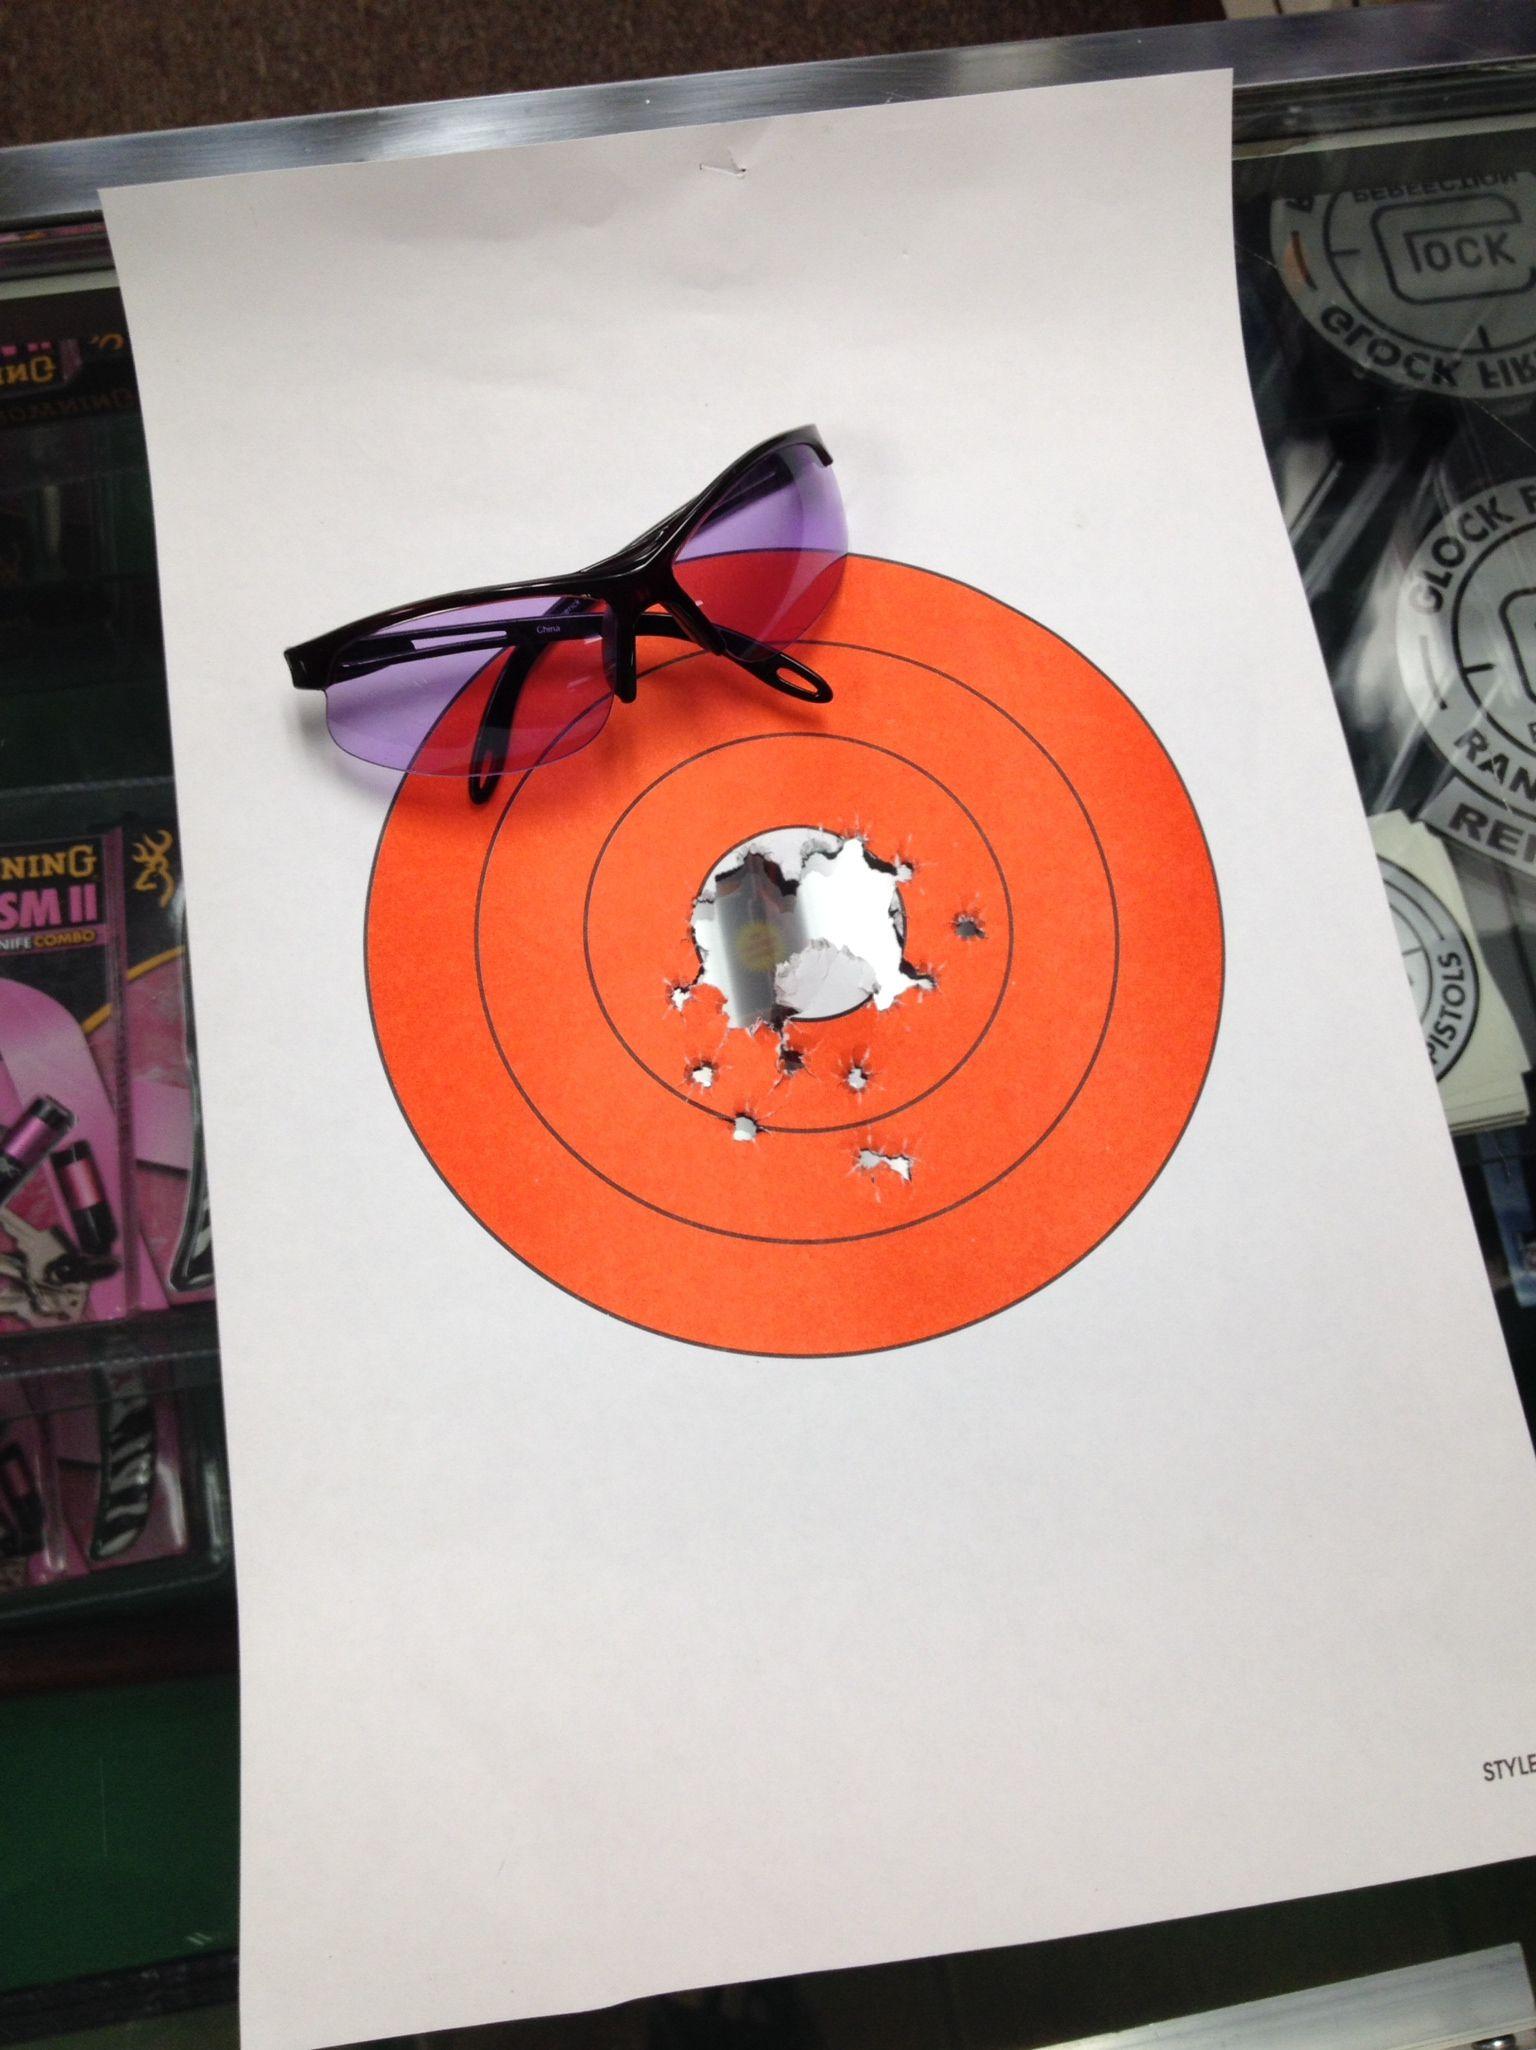 From USCCA instructor training... not bad shootlikeagirl